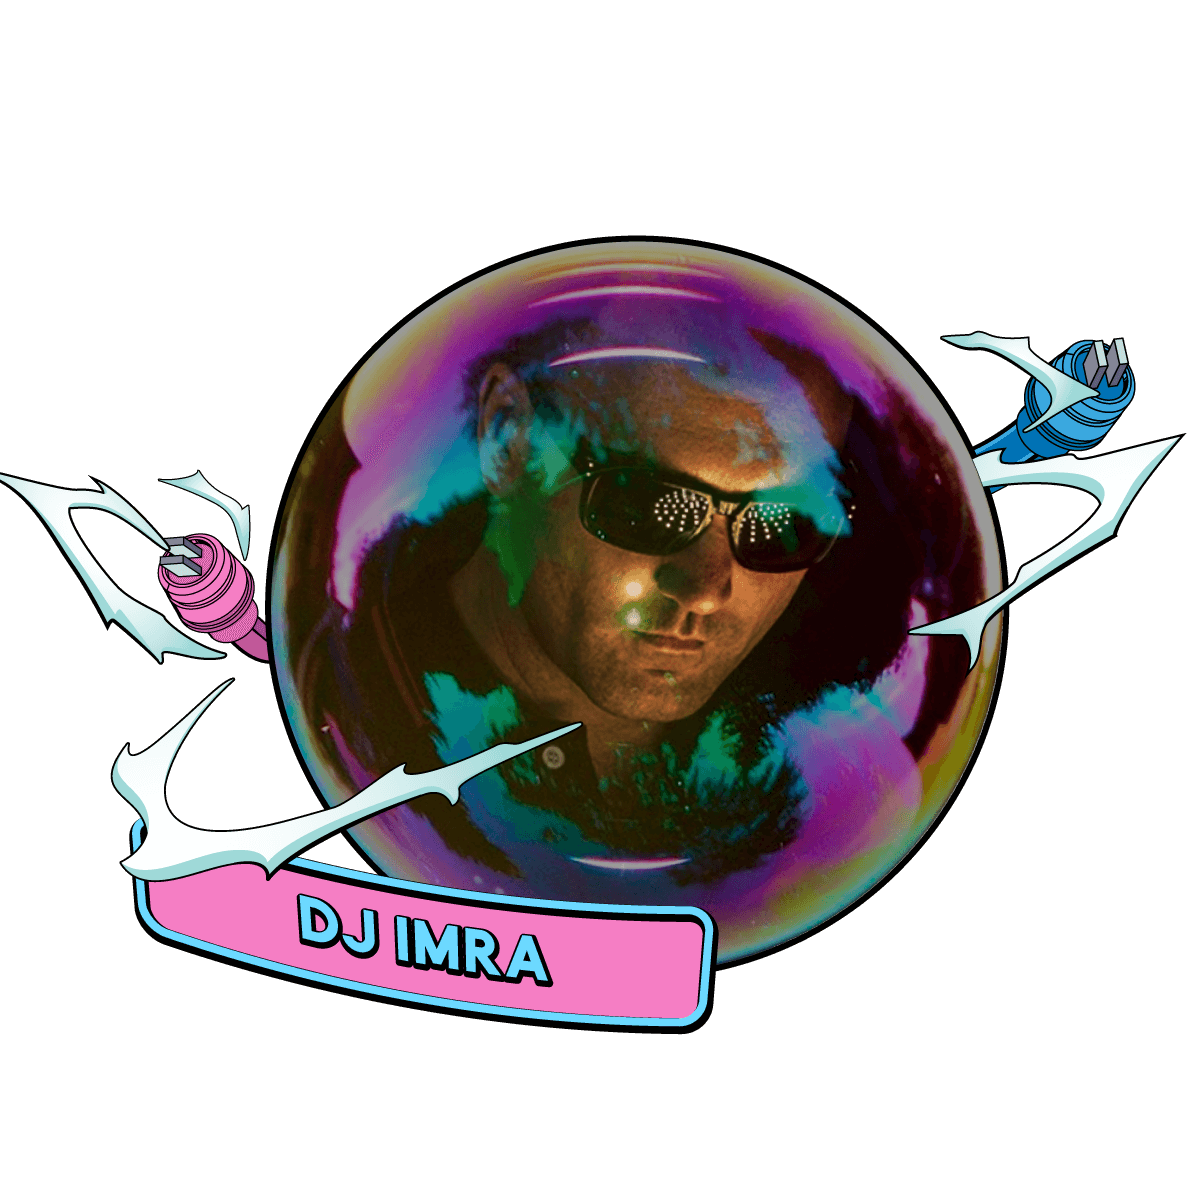 DJ IMRA